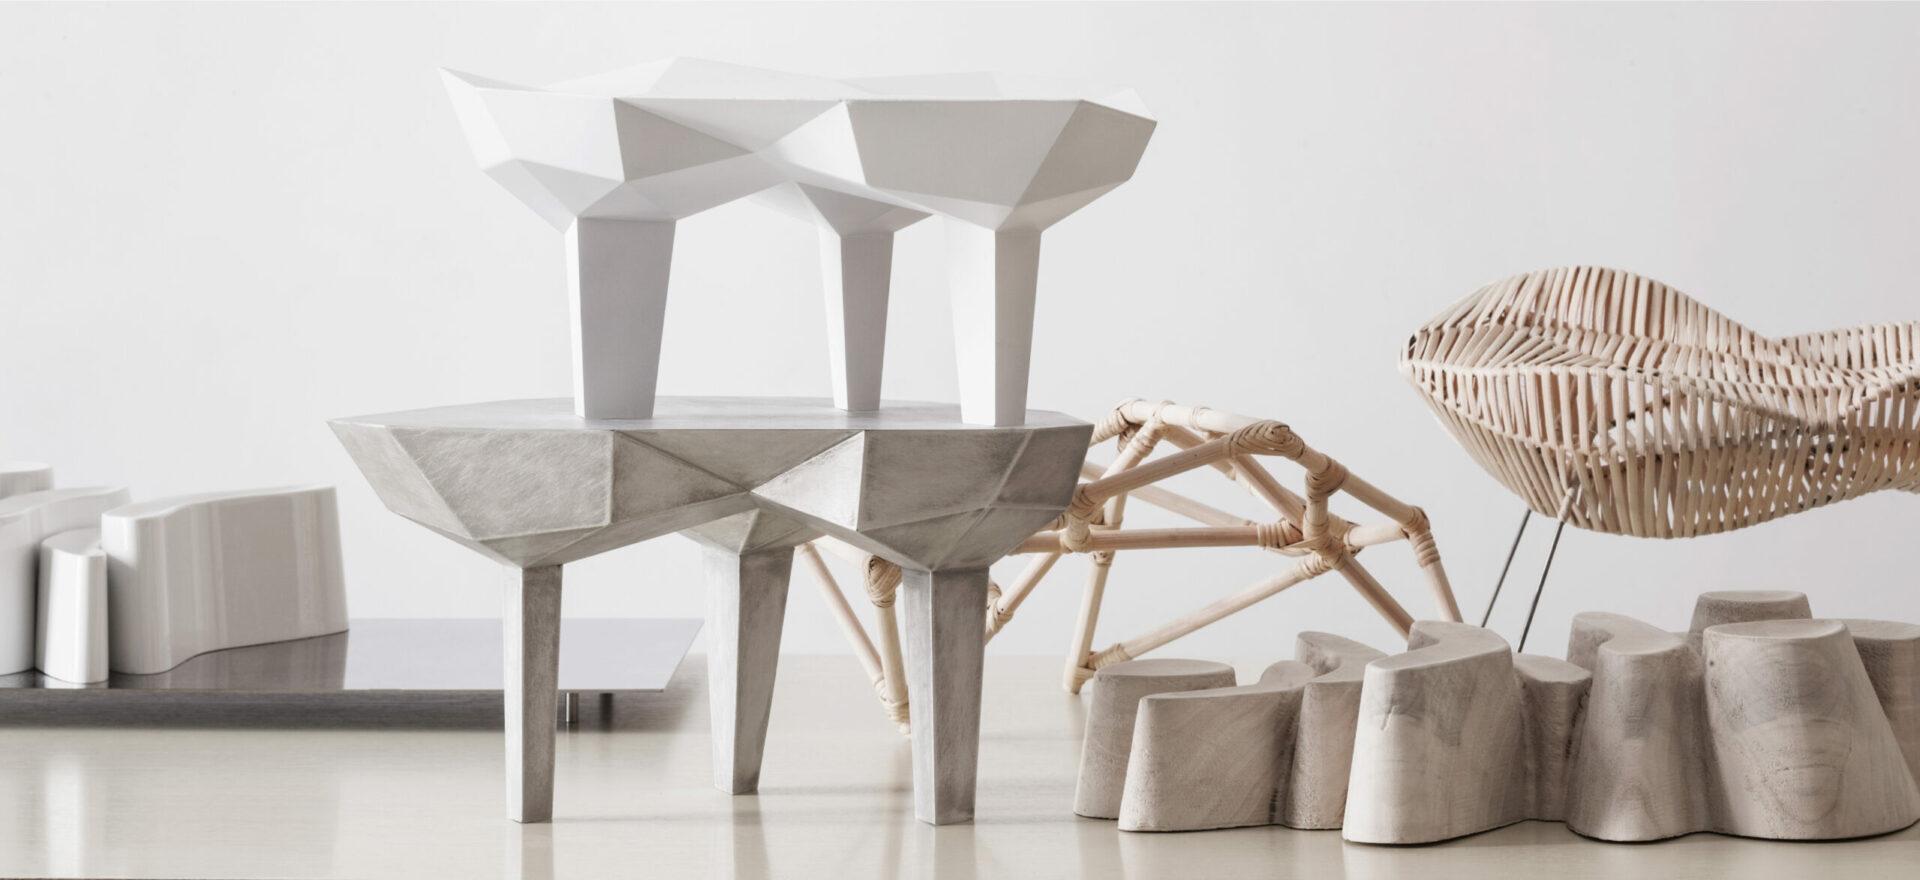 Oggetti Smarritti center pieces by Mario Trimarchi in a white background.